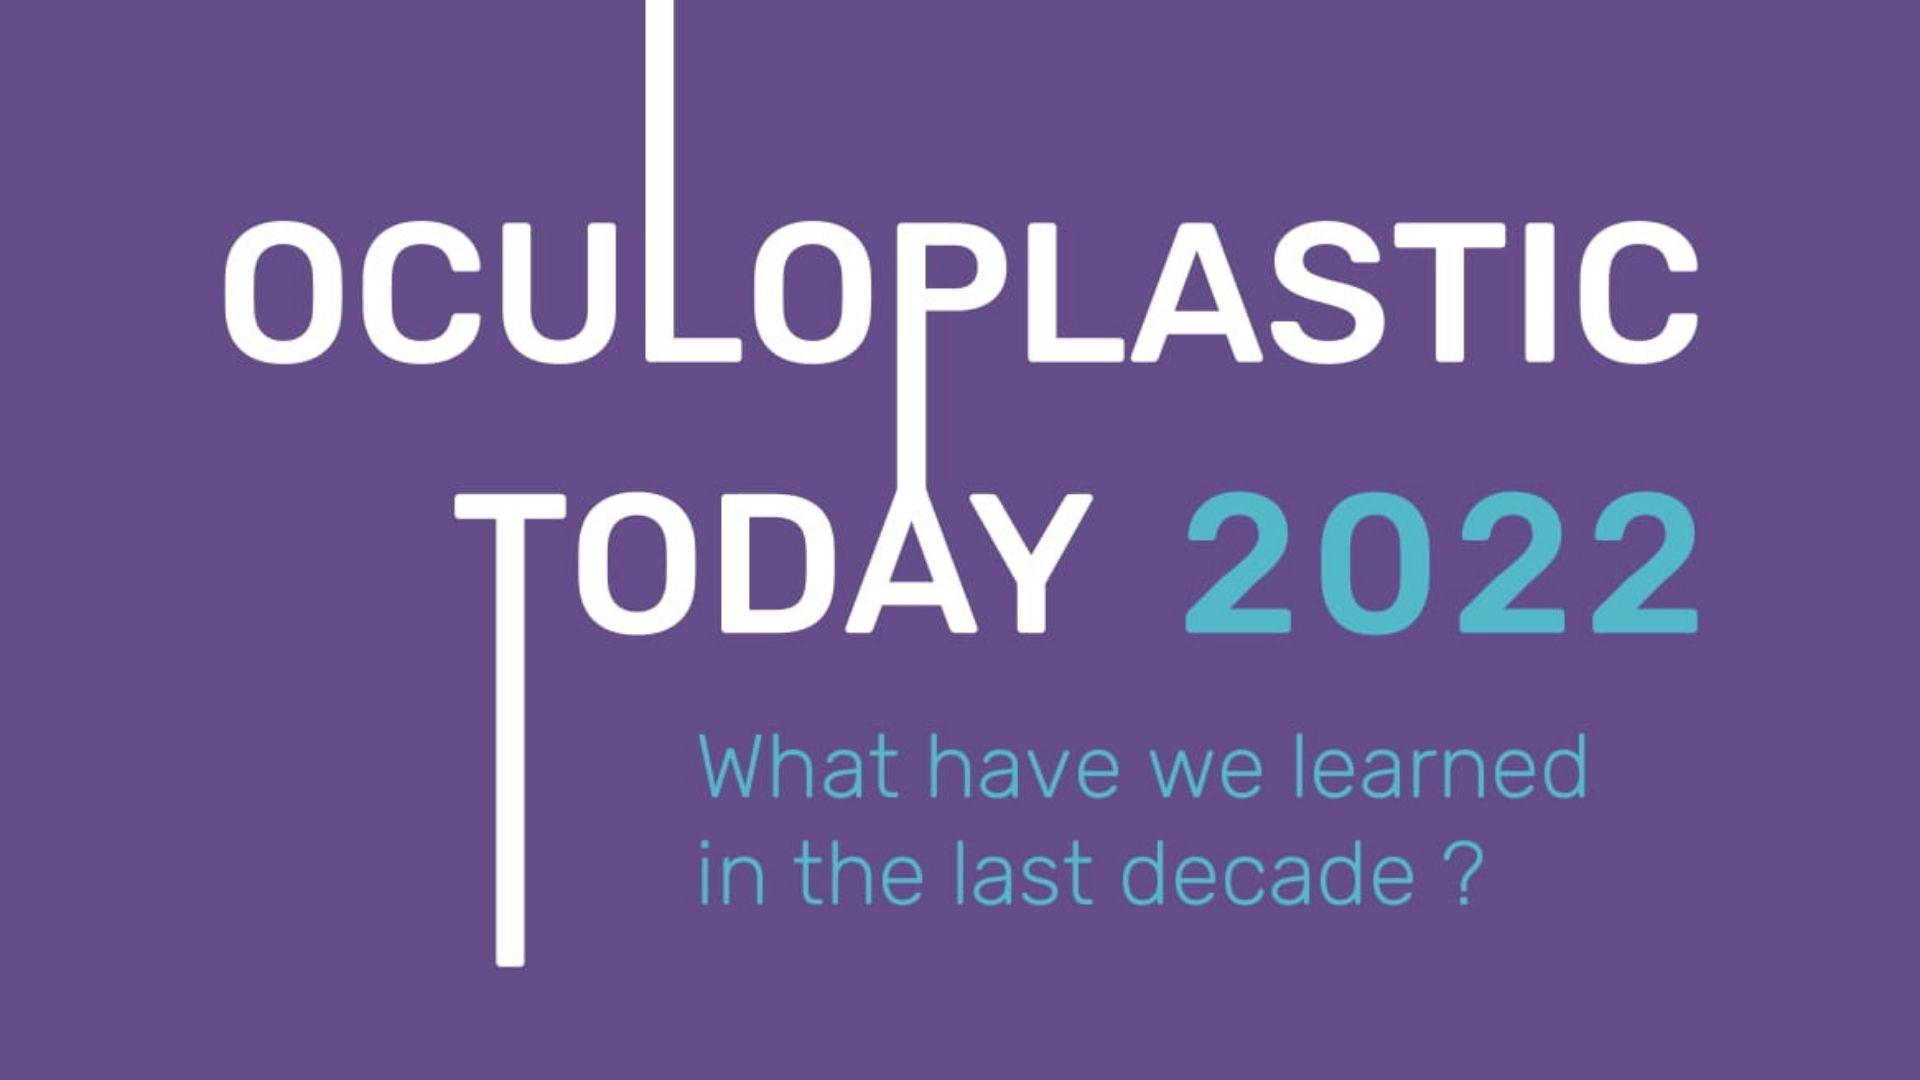 Oculoplastic Today 2022